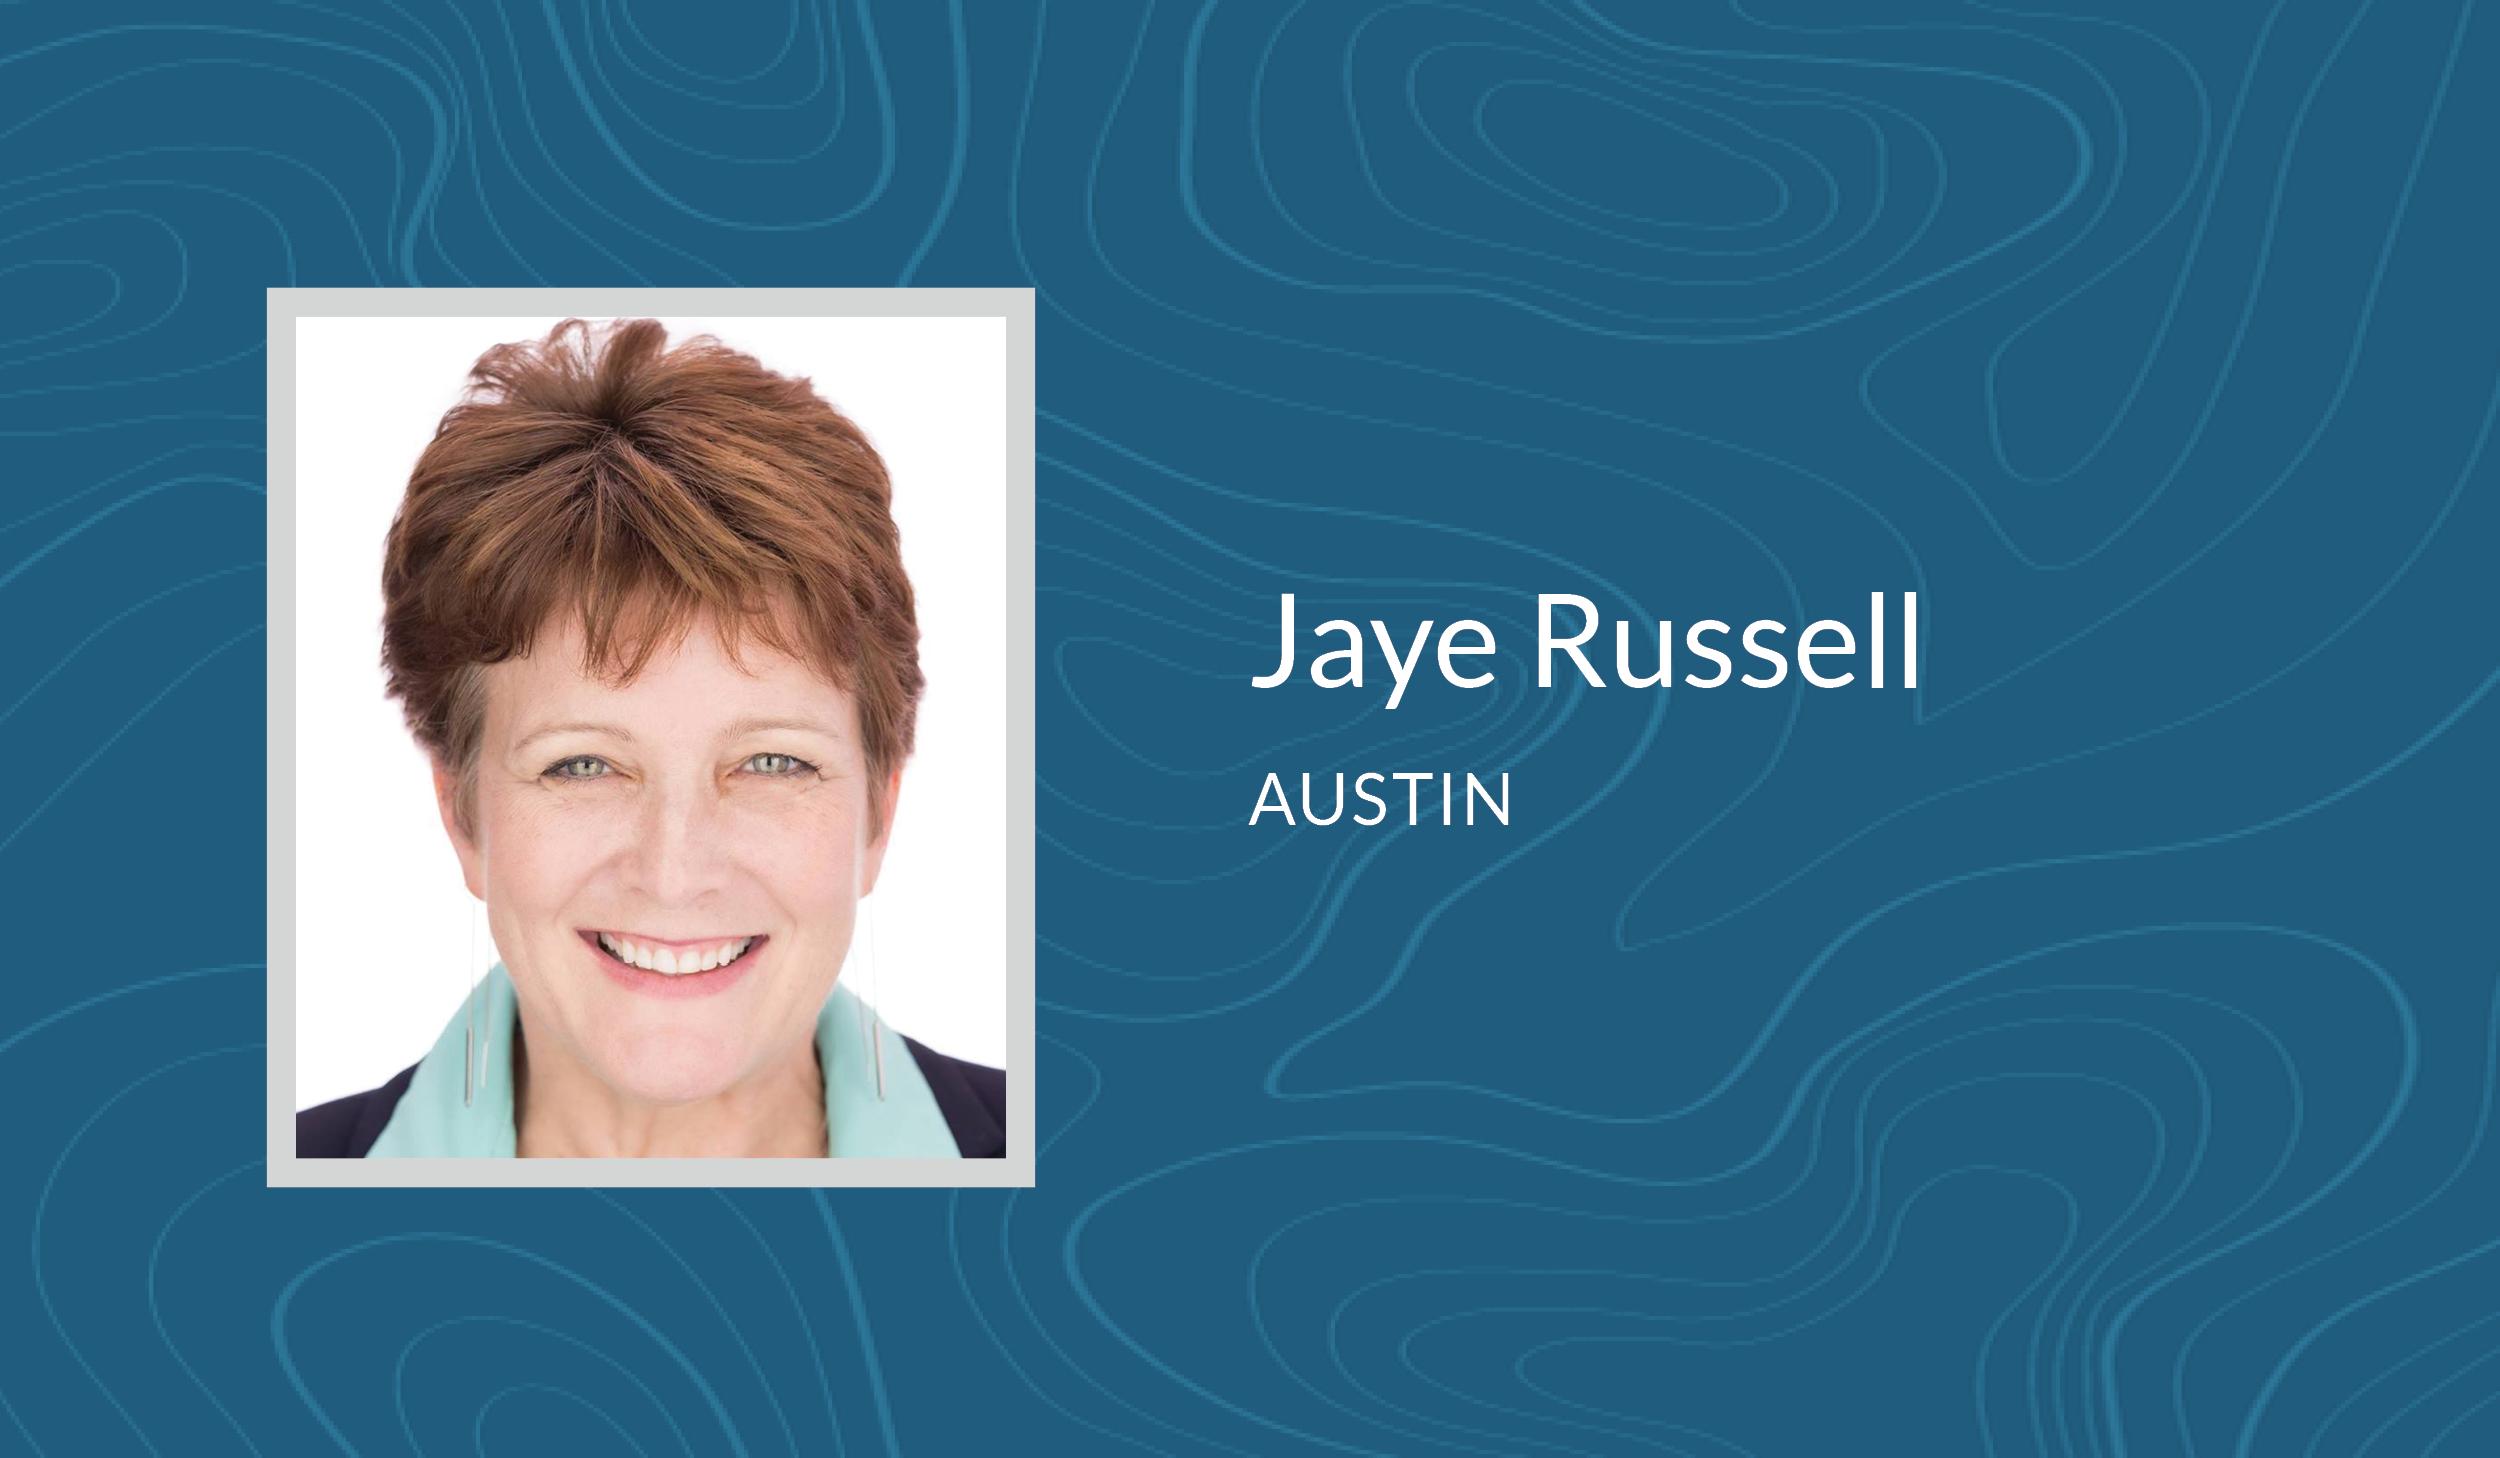 Jaye Russell Landing Page Headers.png